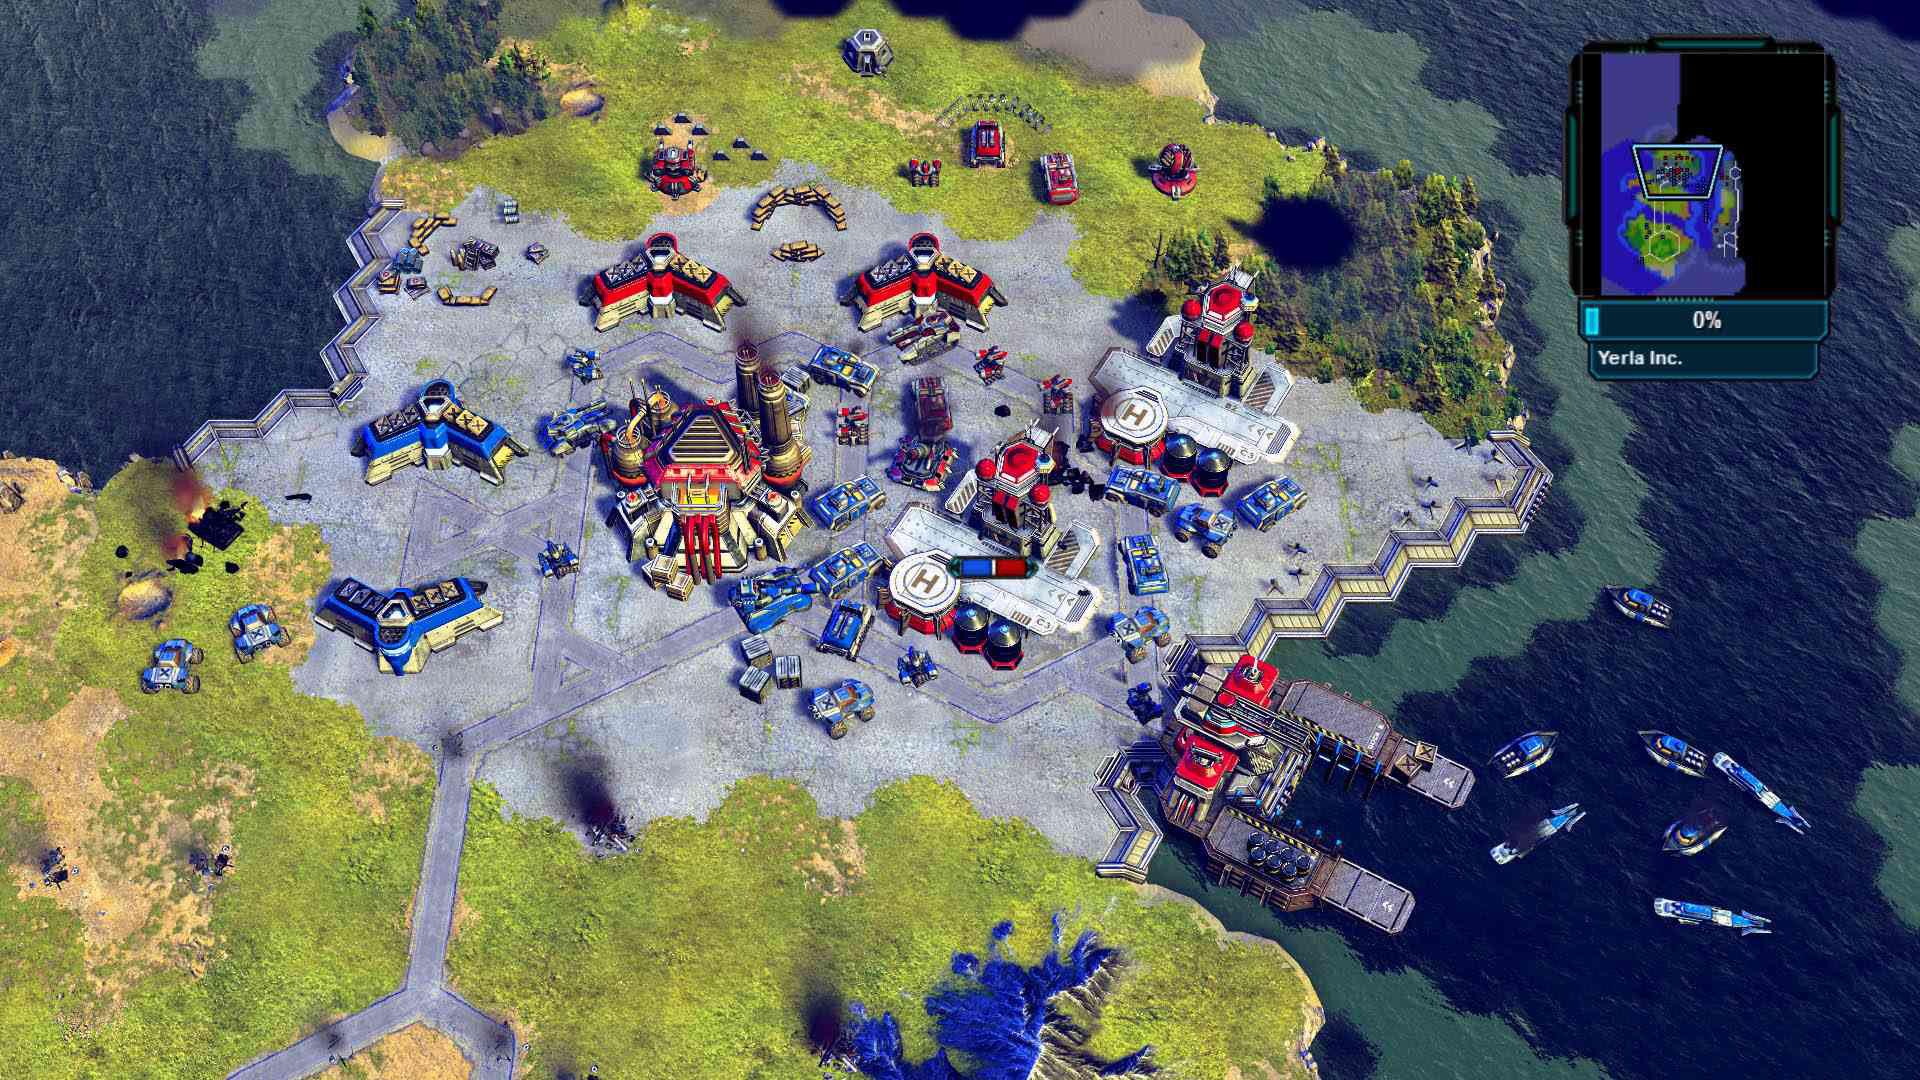 https://media.playstation.com/is/image/SCEA/battle-worlds-kronos-screen-03-us-ps4-26apr16?$MediaCarousel_Original$